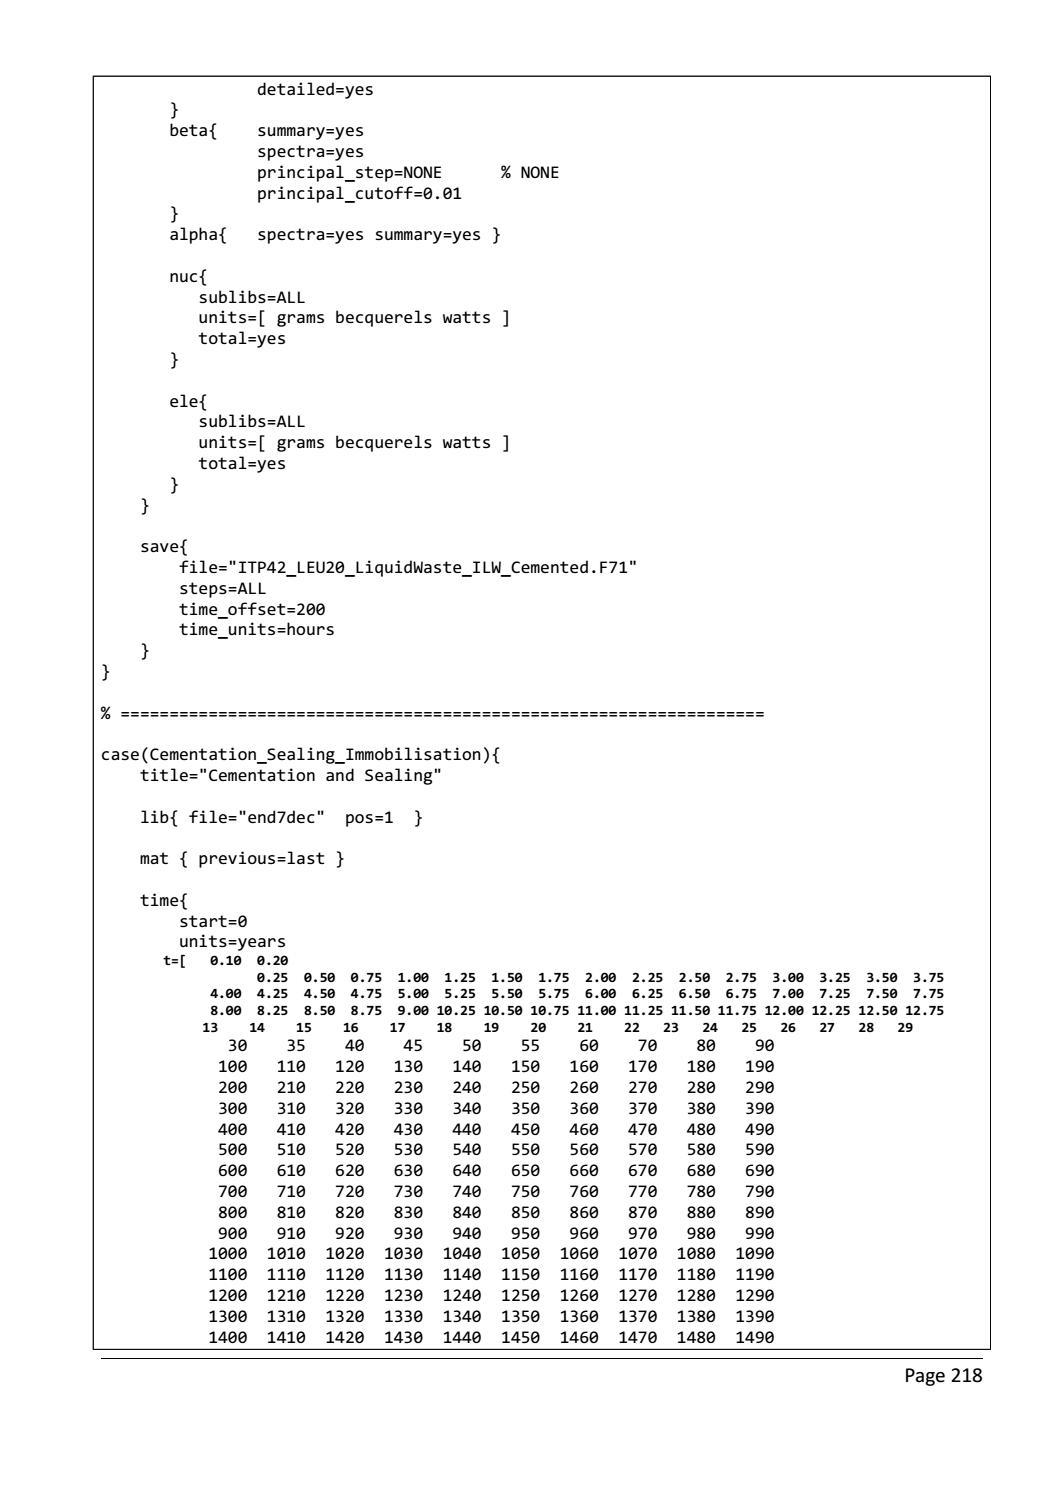 RADIOACTIVE WASTE: COMPUTATIONAL CHARACTERISATION and SHIELDING page 243